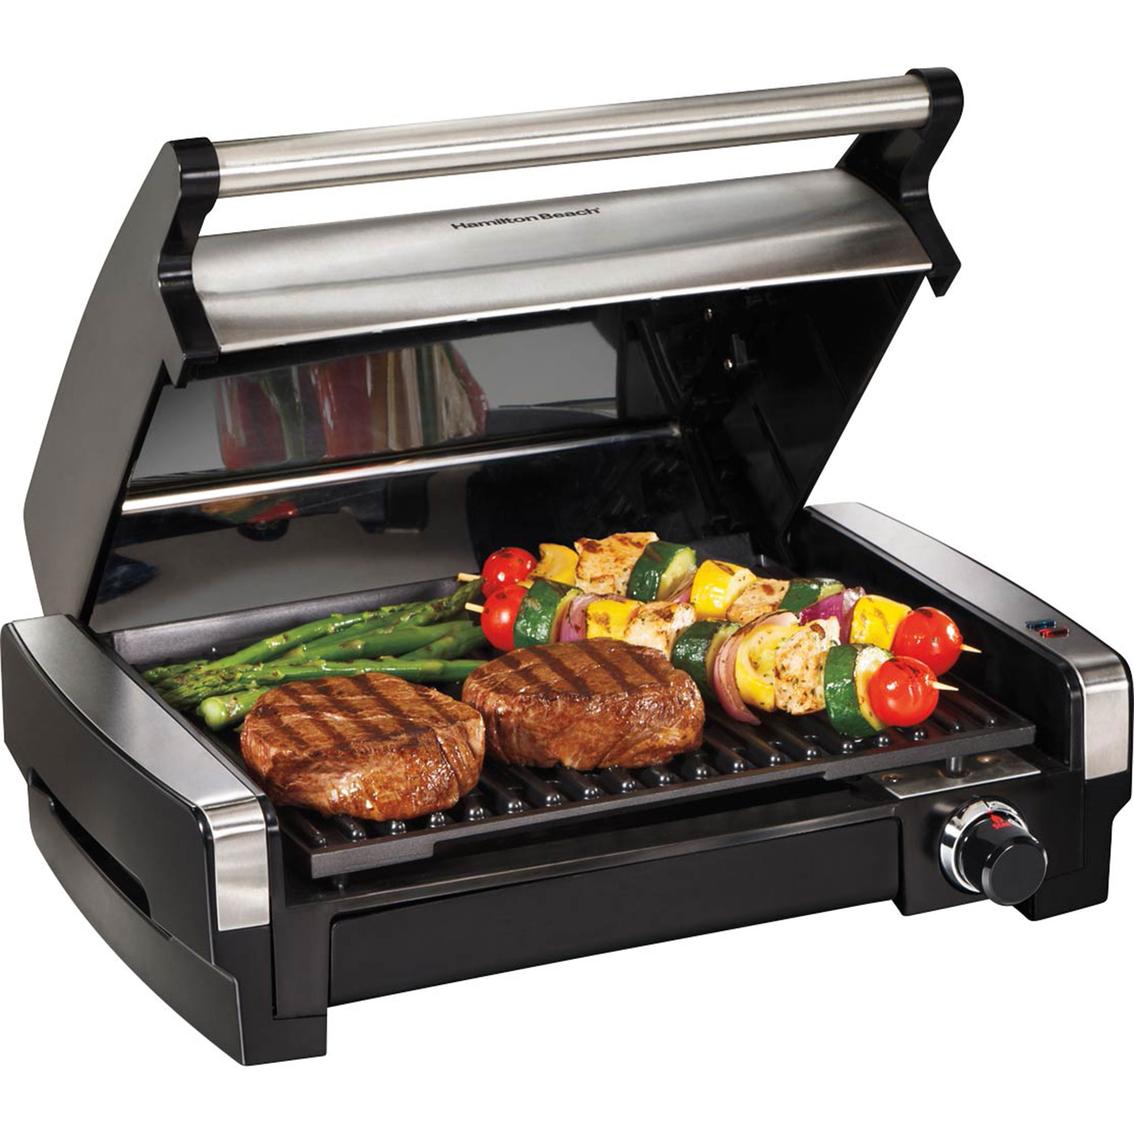 hamilton beach searing grill 25360 manual